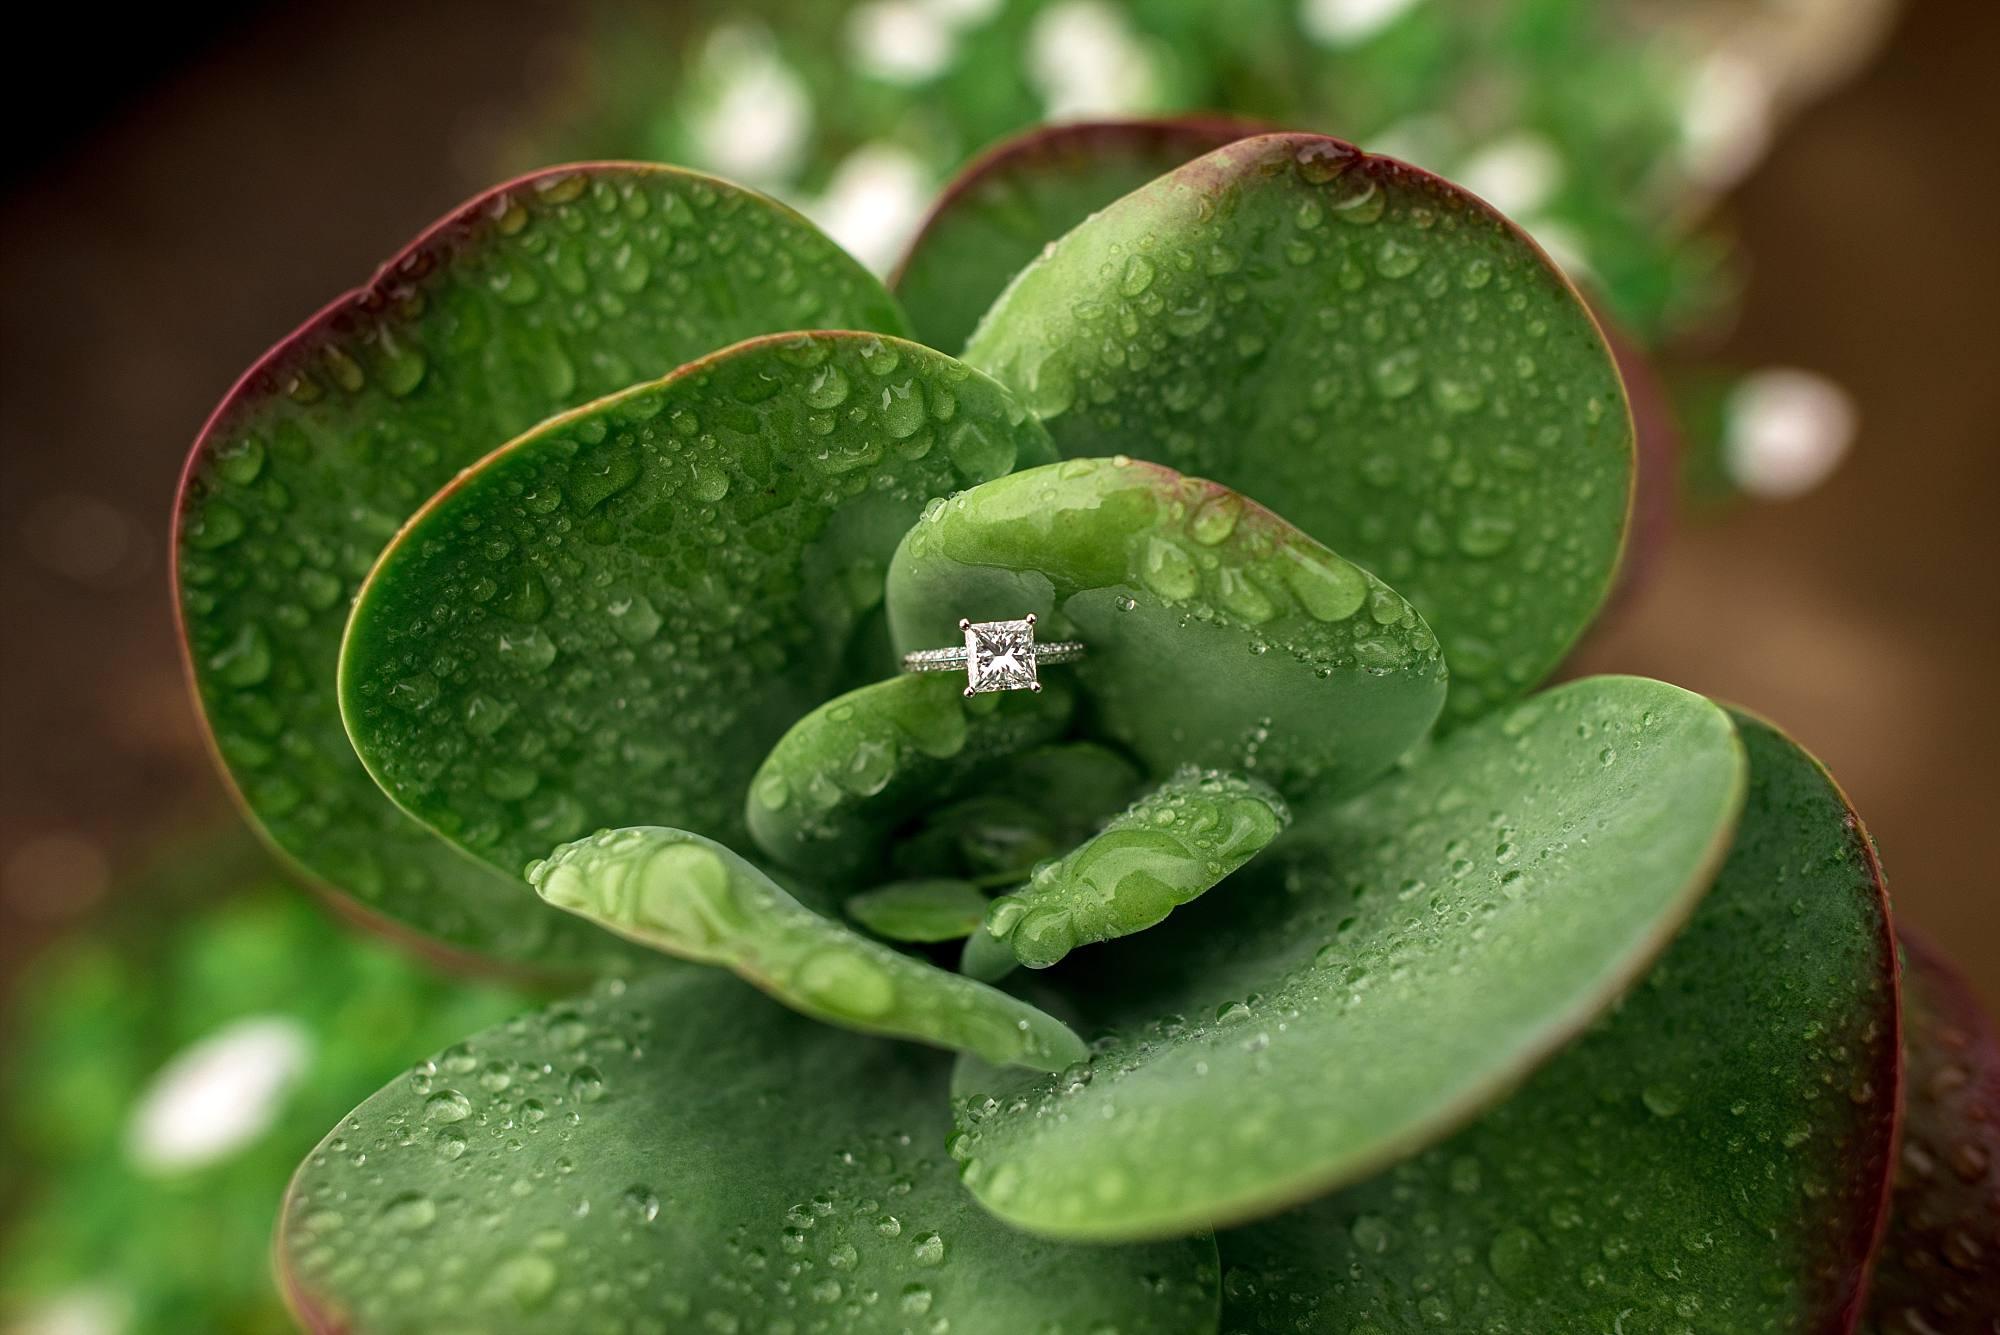 princess cut diamond engagmenet ring in dew covered greenery